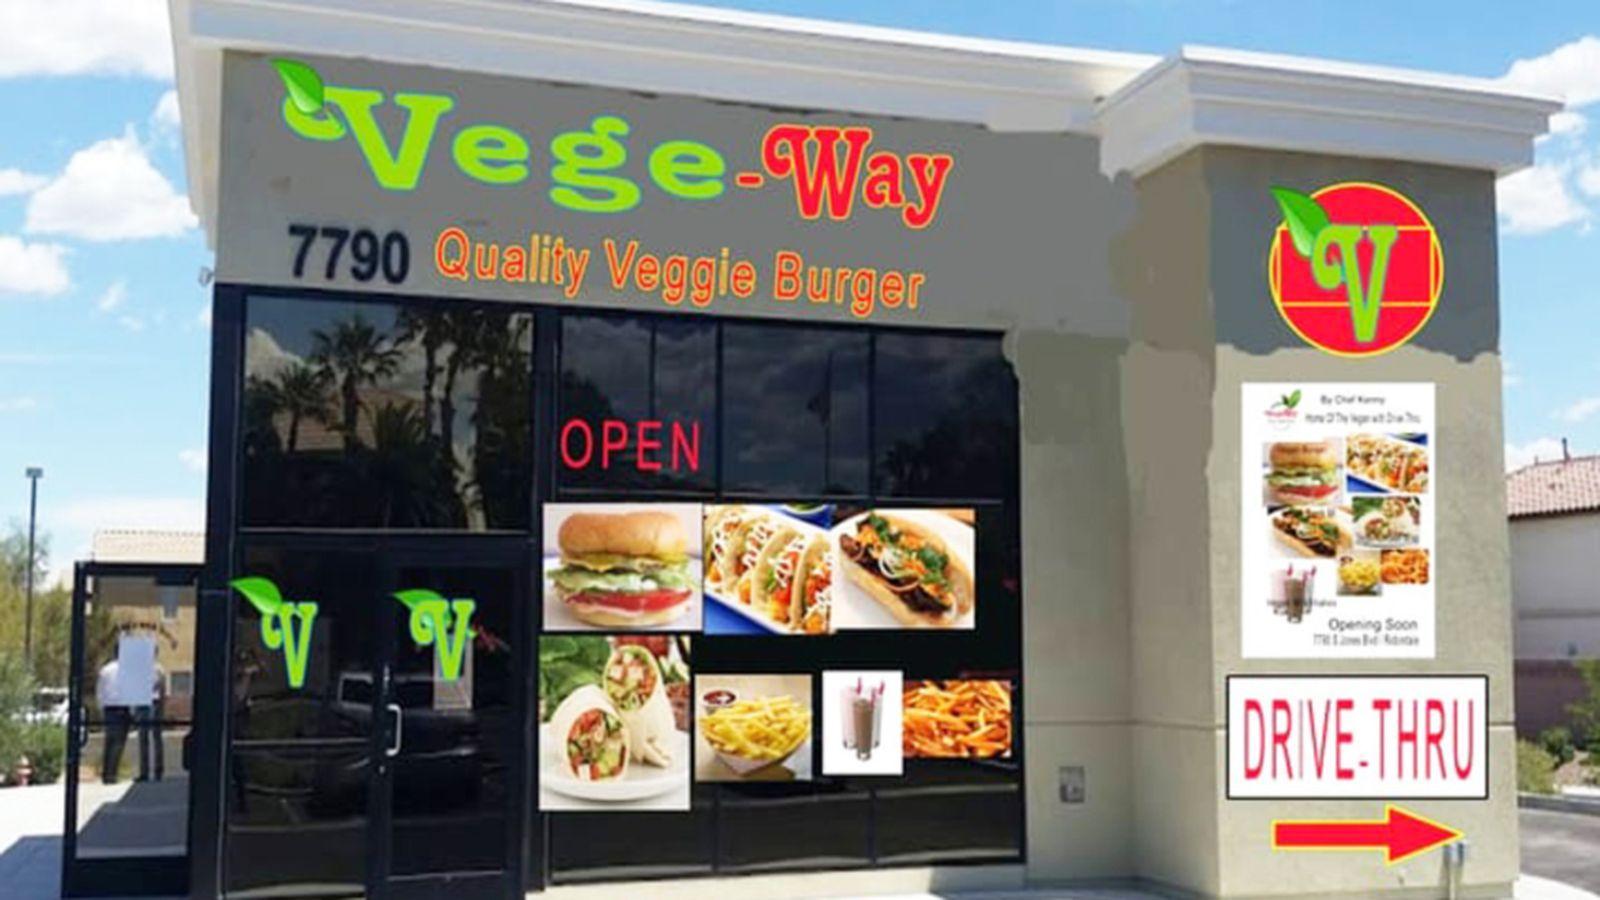 Vegeway Debuts Plant Based Fast Food And Drive Thru Burger Vegan Restaurants Vegan Travel